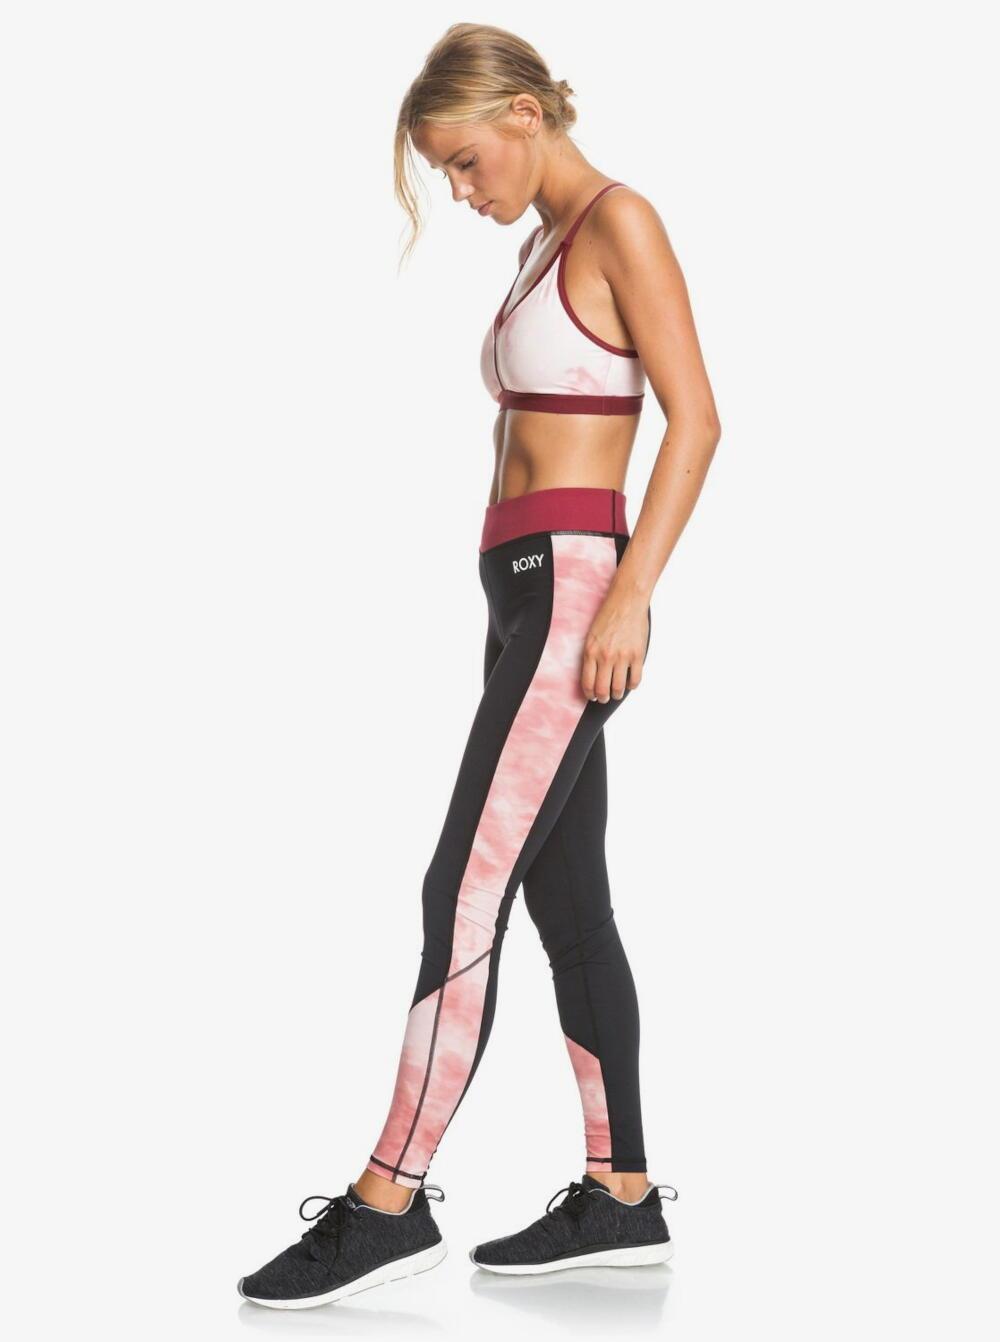 Roxy Fitness 15